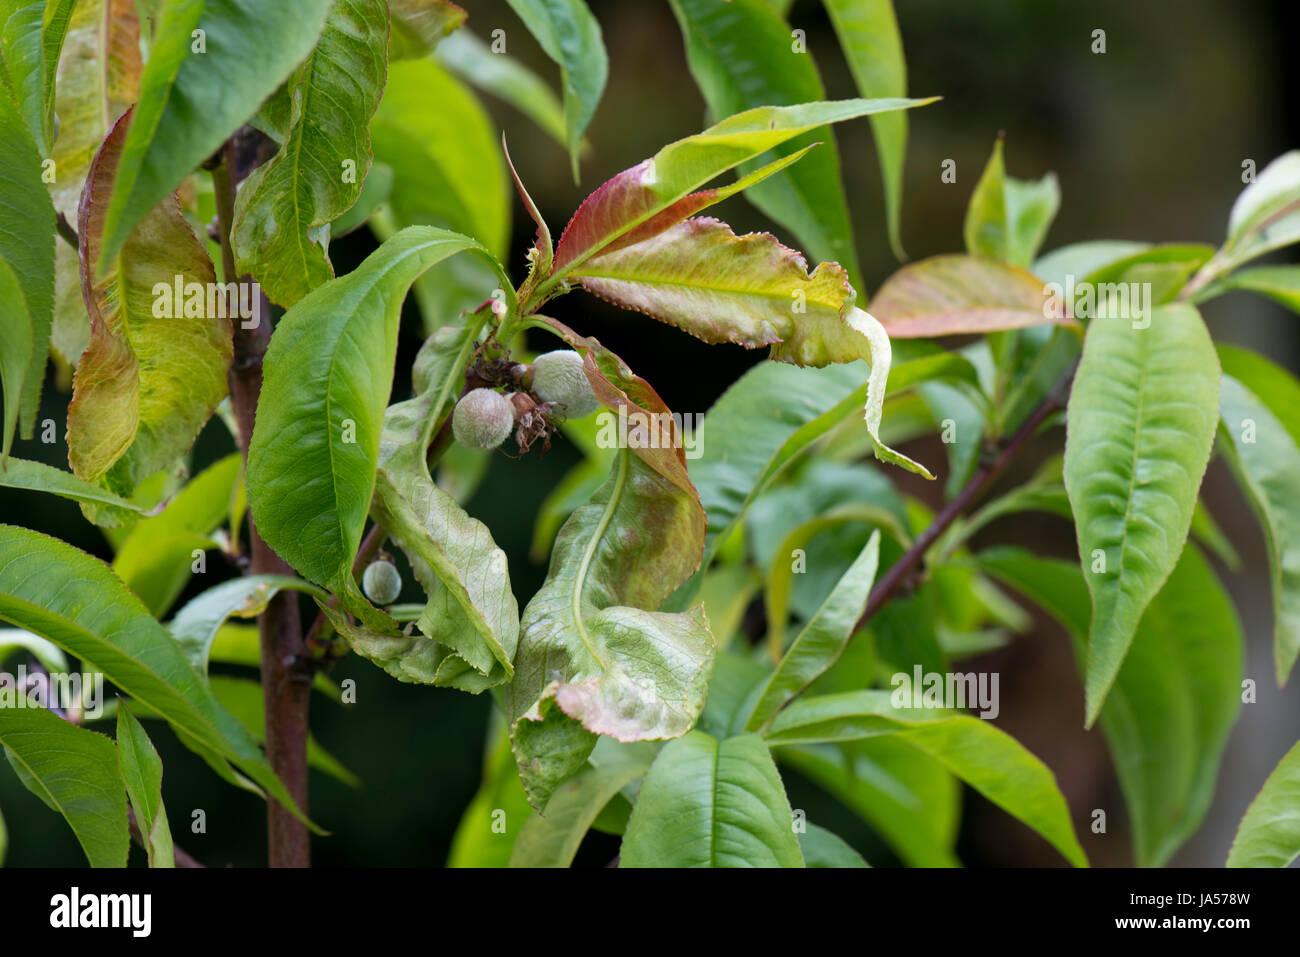 nectarine orchard photos nectarine orchard images alamy. Black Bedroom Furniture Sets. Home Design Ideas